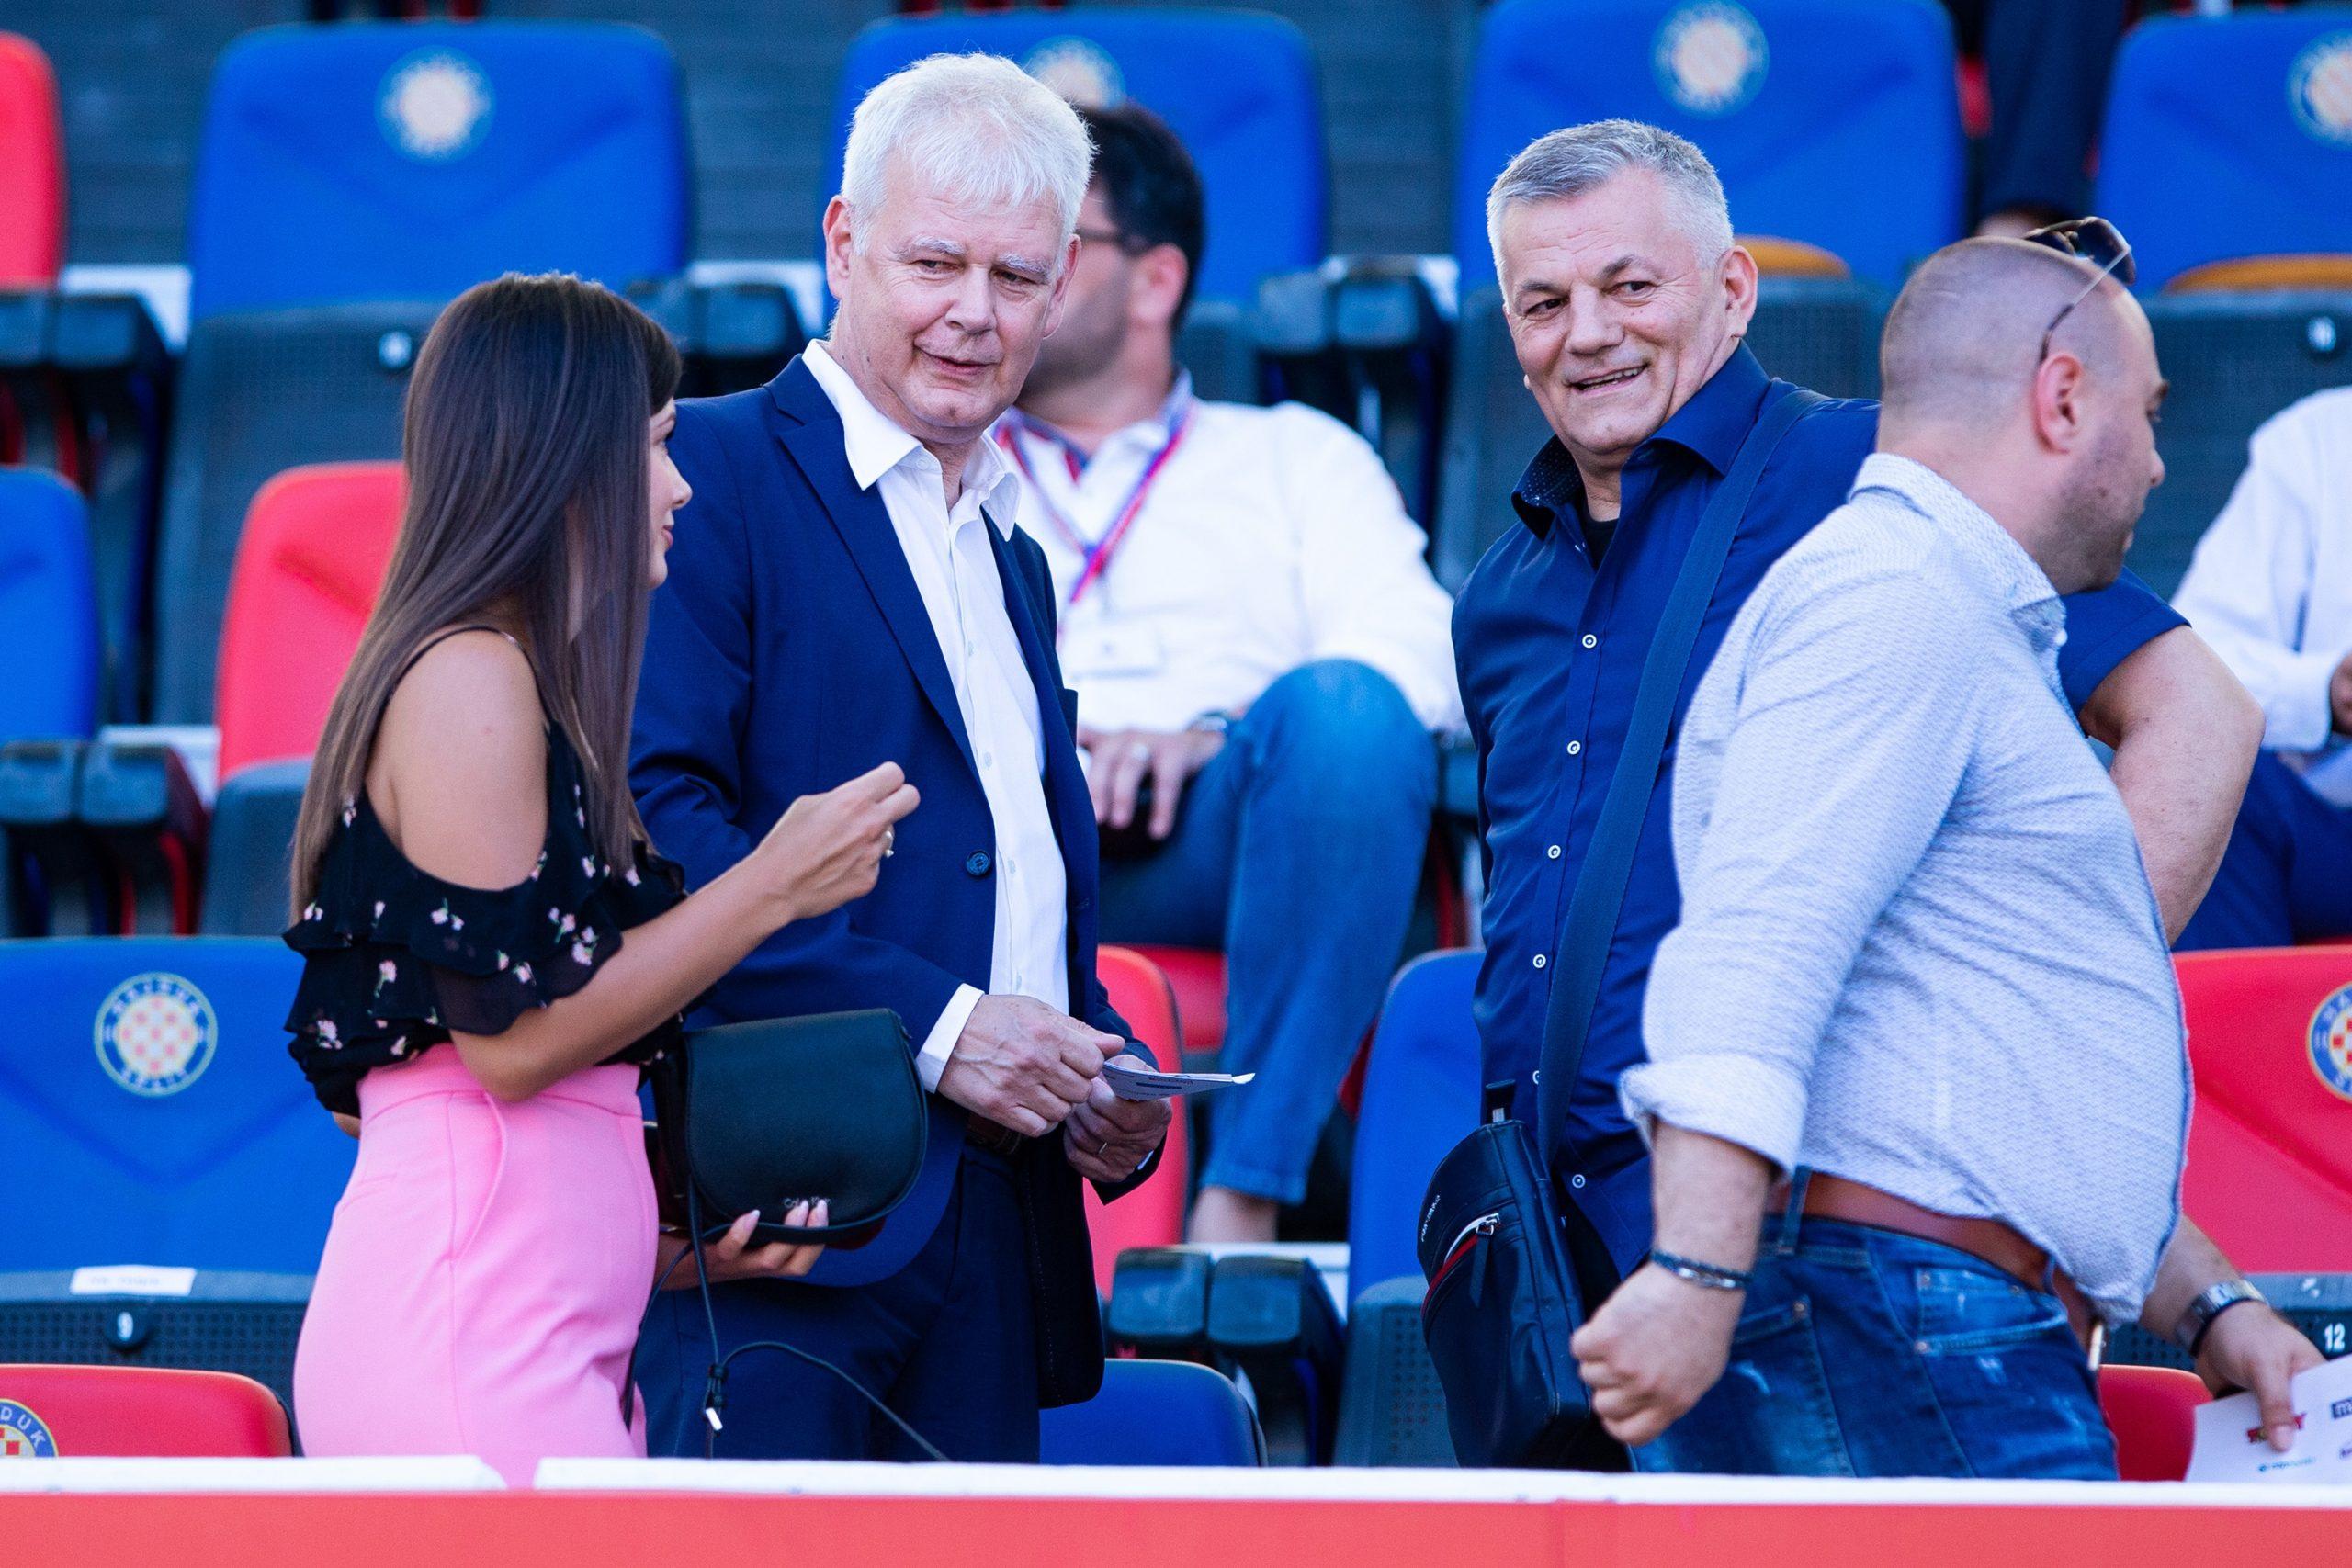 Marin Brbić i Ivan Gudelj u loži uoči početka utakmice s Osijekom/Foto PIXSELL